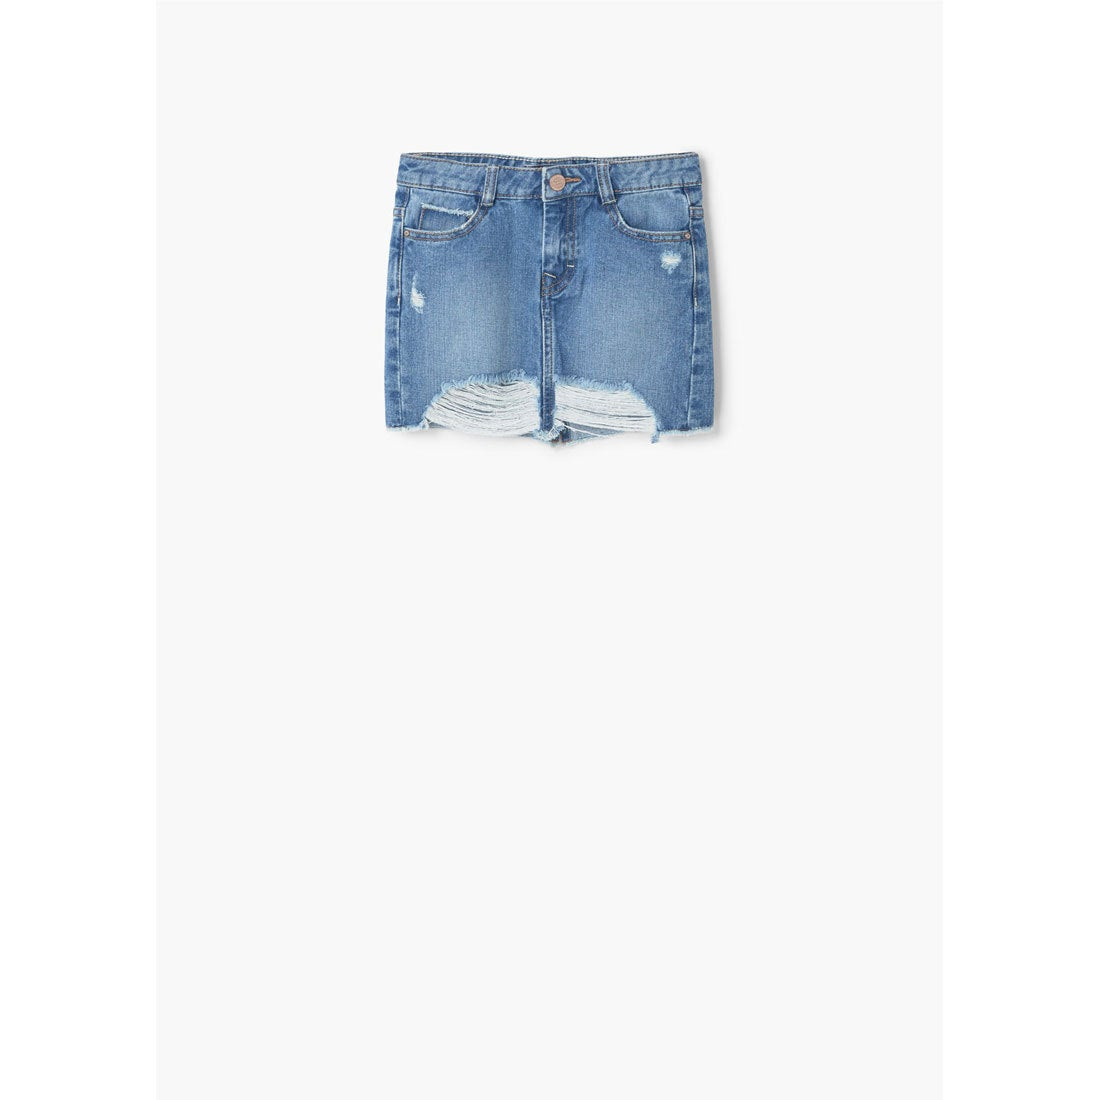 【SALE 35%OFF】スカート . FリングED (ミディアムデニムブルー)